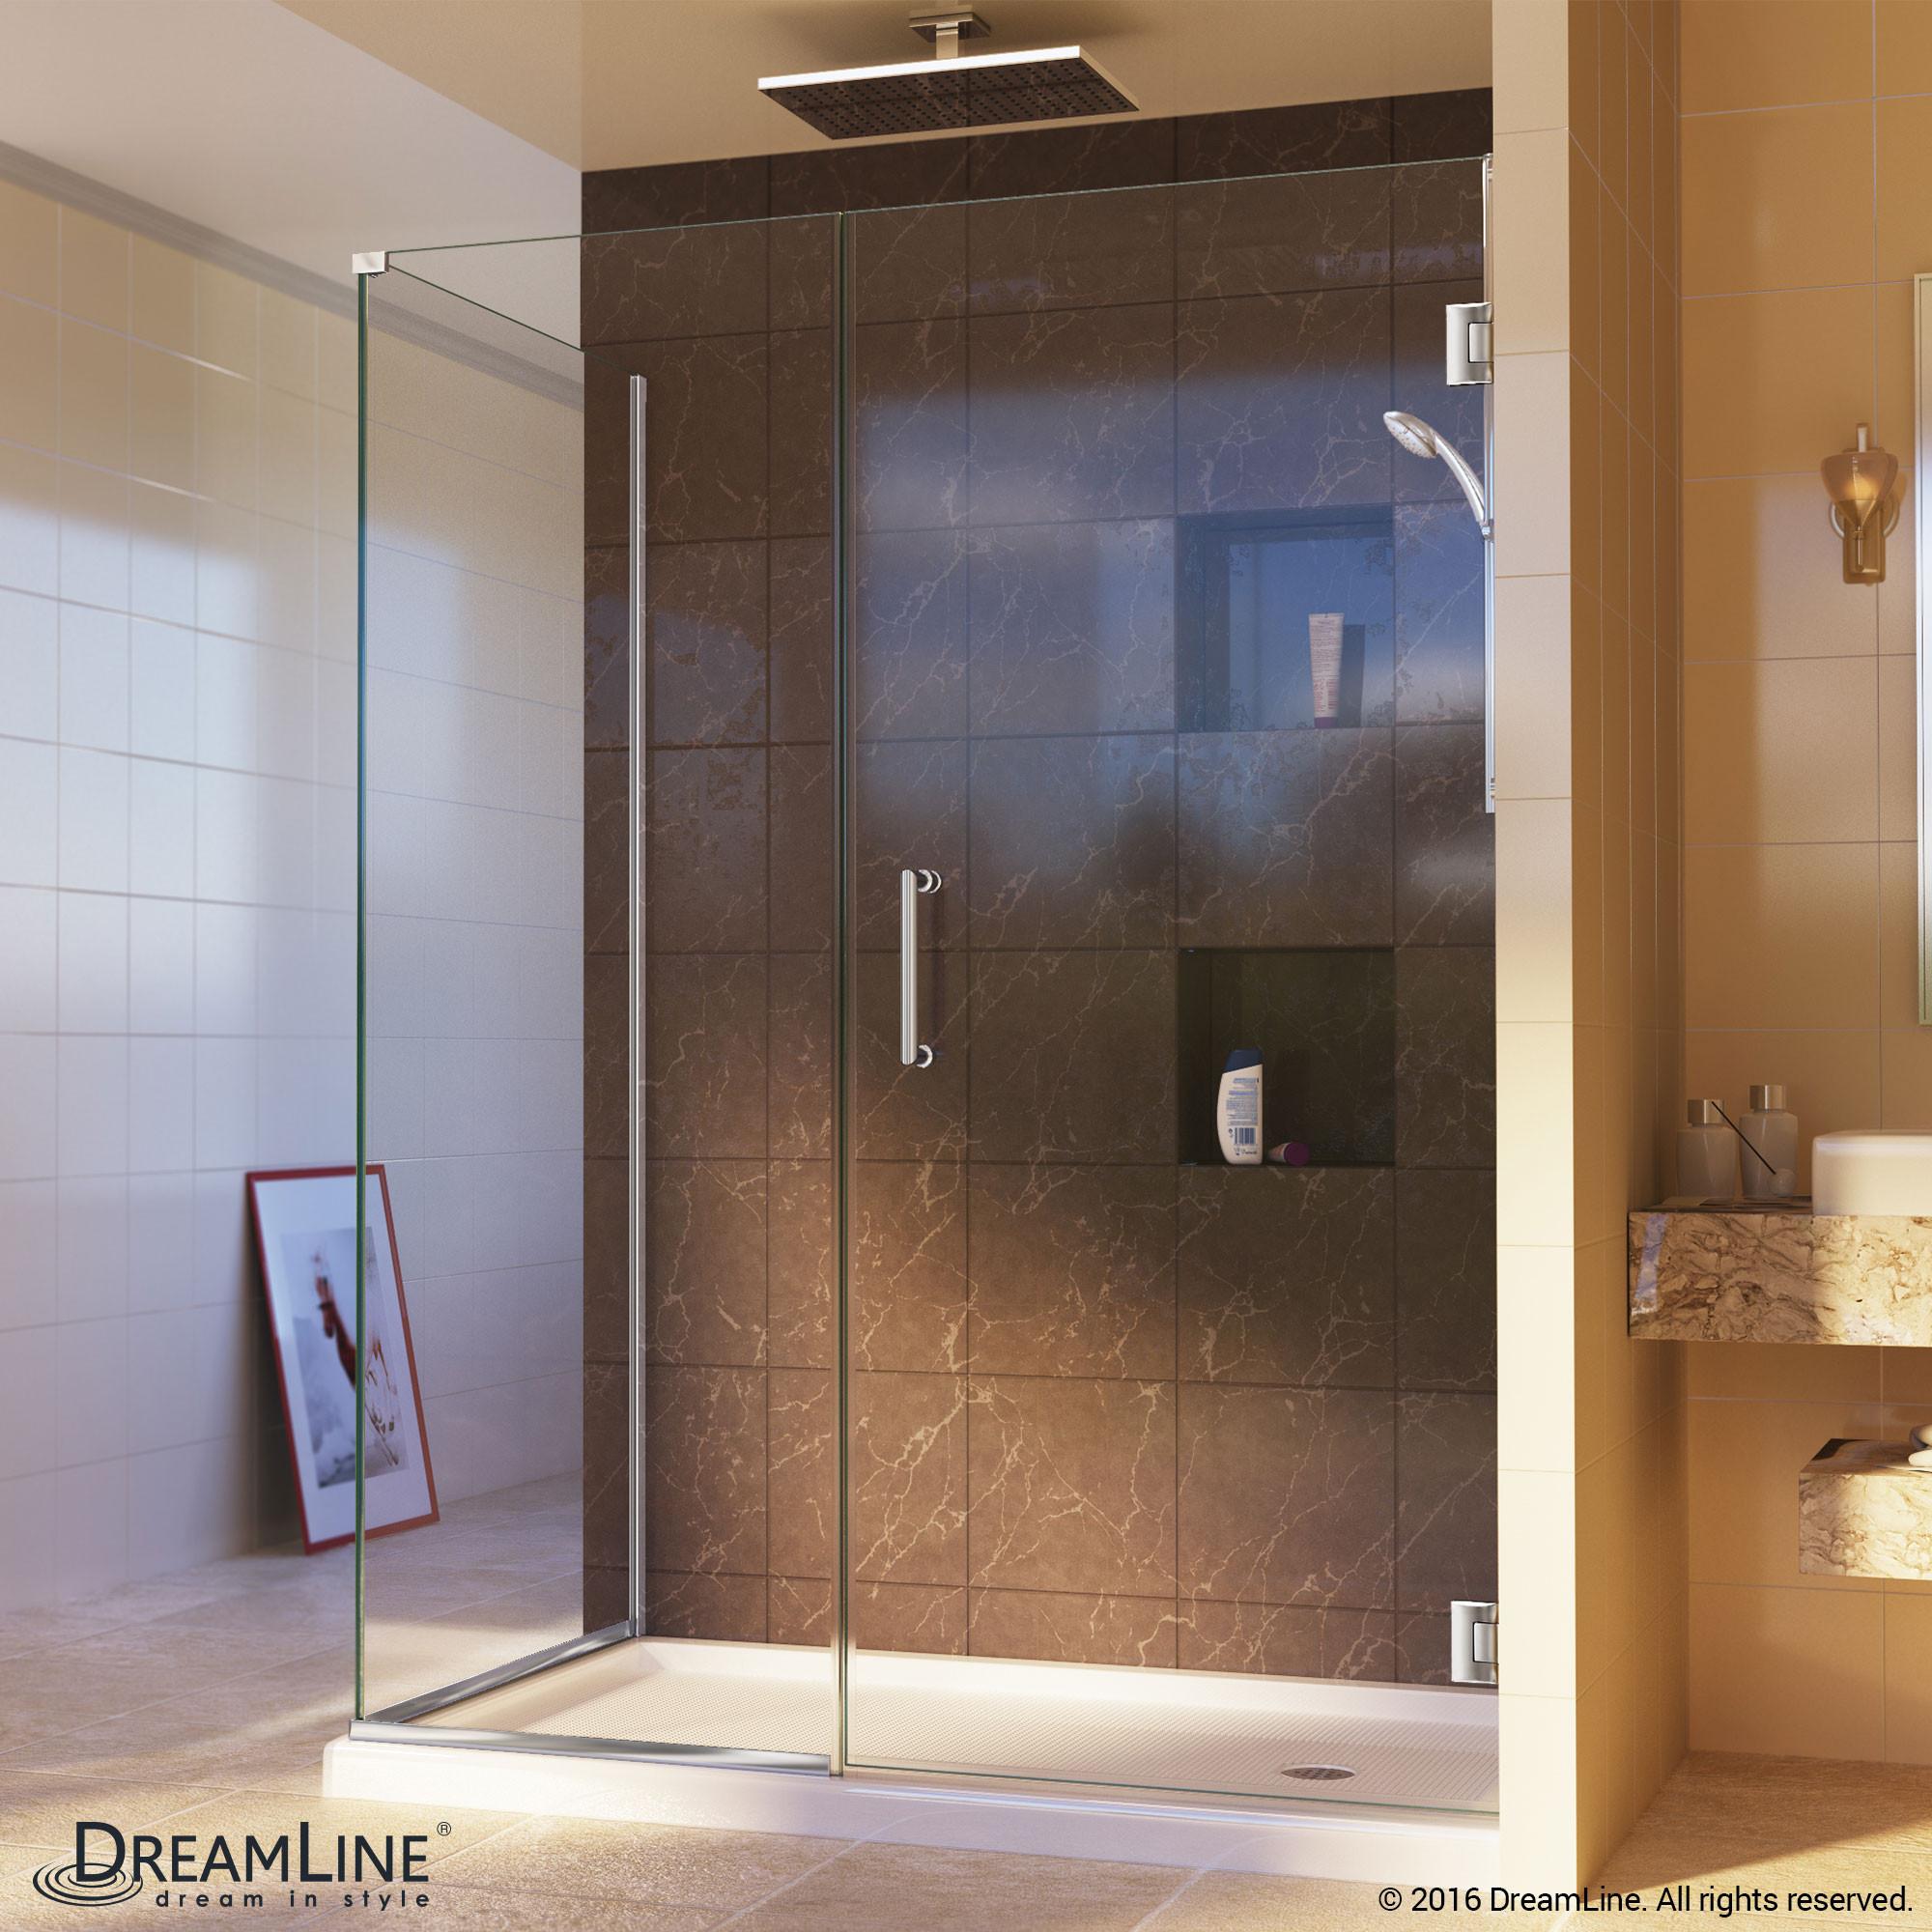 DreamLine SHEN-24465340-01 Unidoor Plus Hinged Shower Enclosure In Chrome Finish Hardware